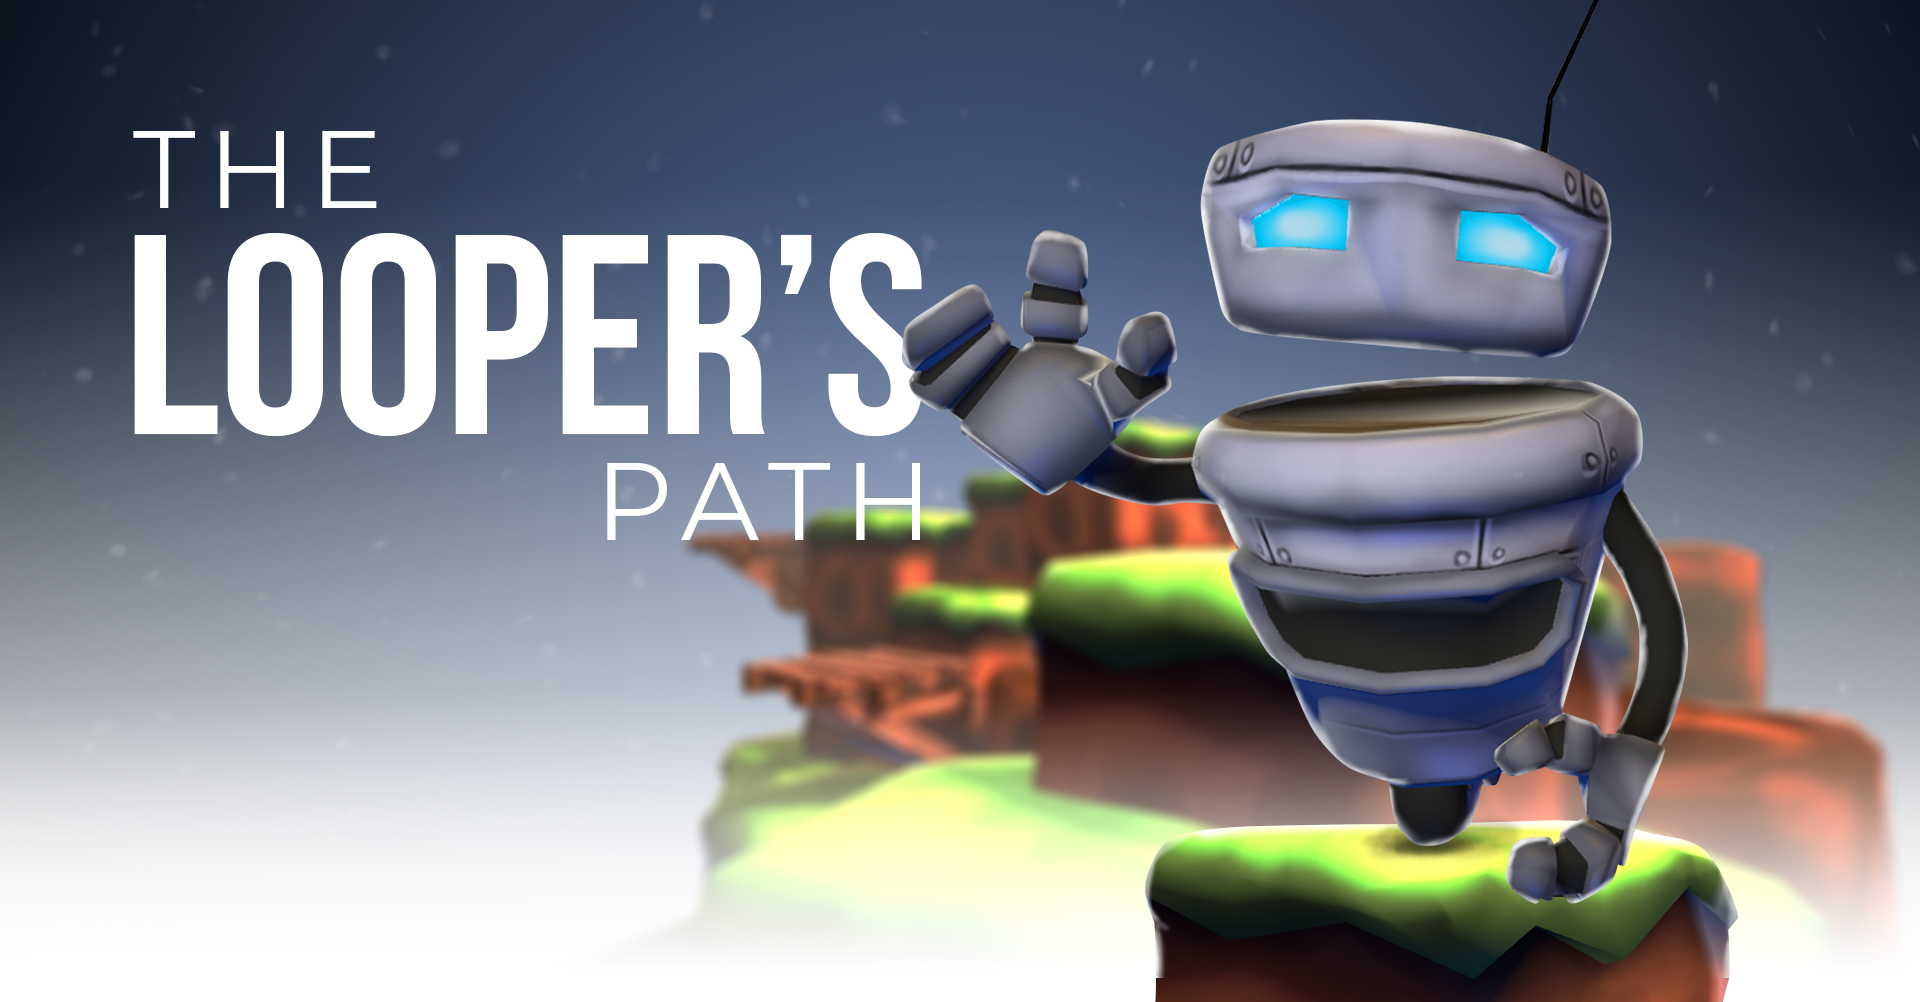 The Looper's Path